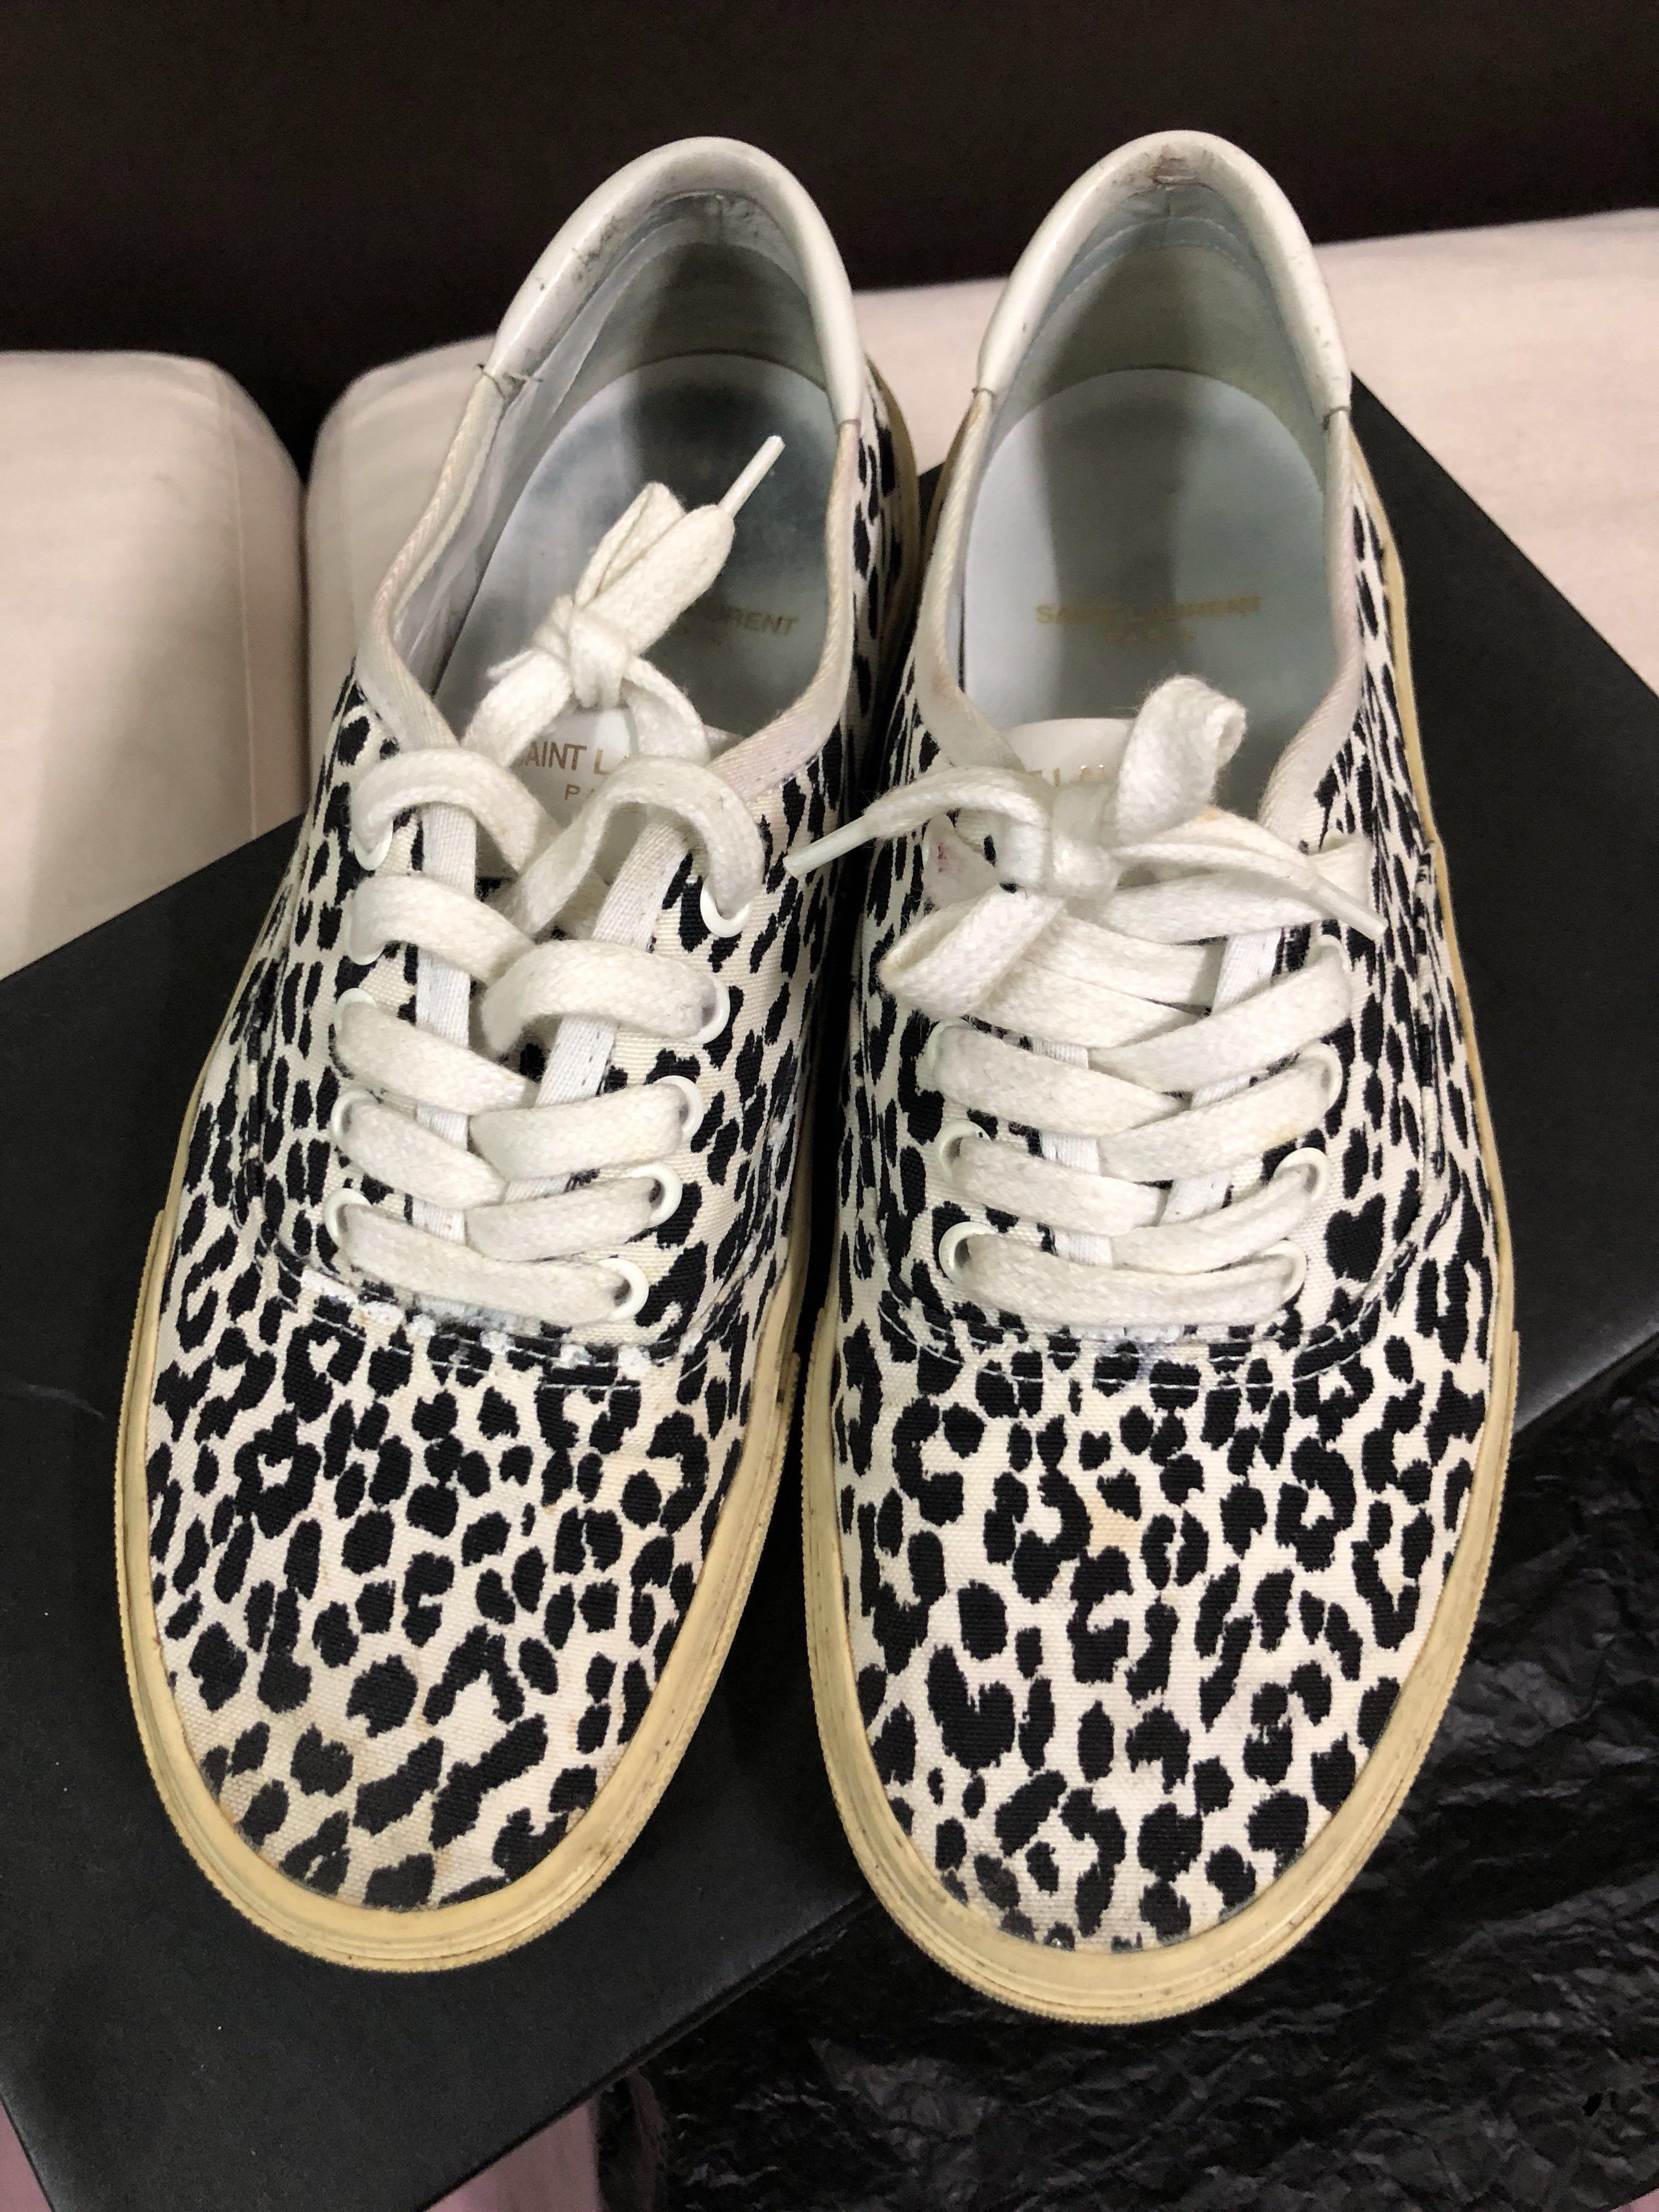 65b0aa4762f Saint Laurent SLP babycat baby cat sneakers size 42 skate shoe, Men's  Fashion, Footwear, Sneakers on Carousell